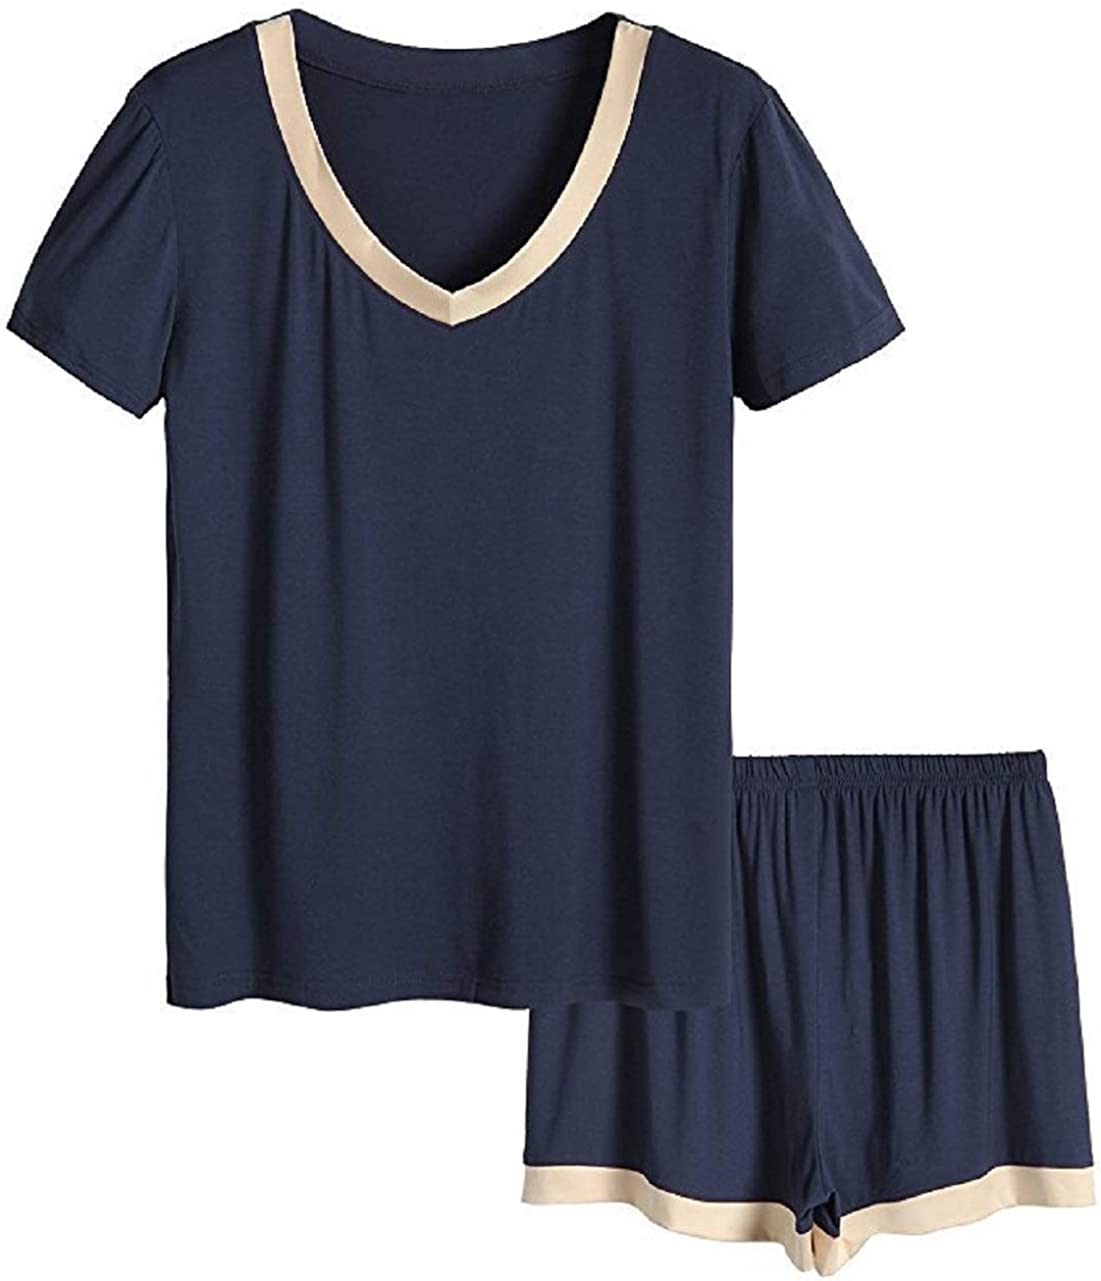 Elonglin Women's Pajama Set Summer T-Shirt Top & Shorts Soft Modal Sleepwear Set